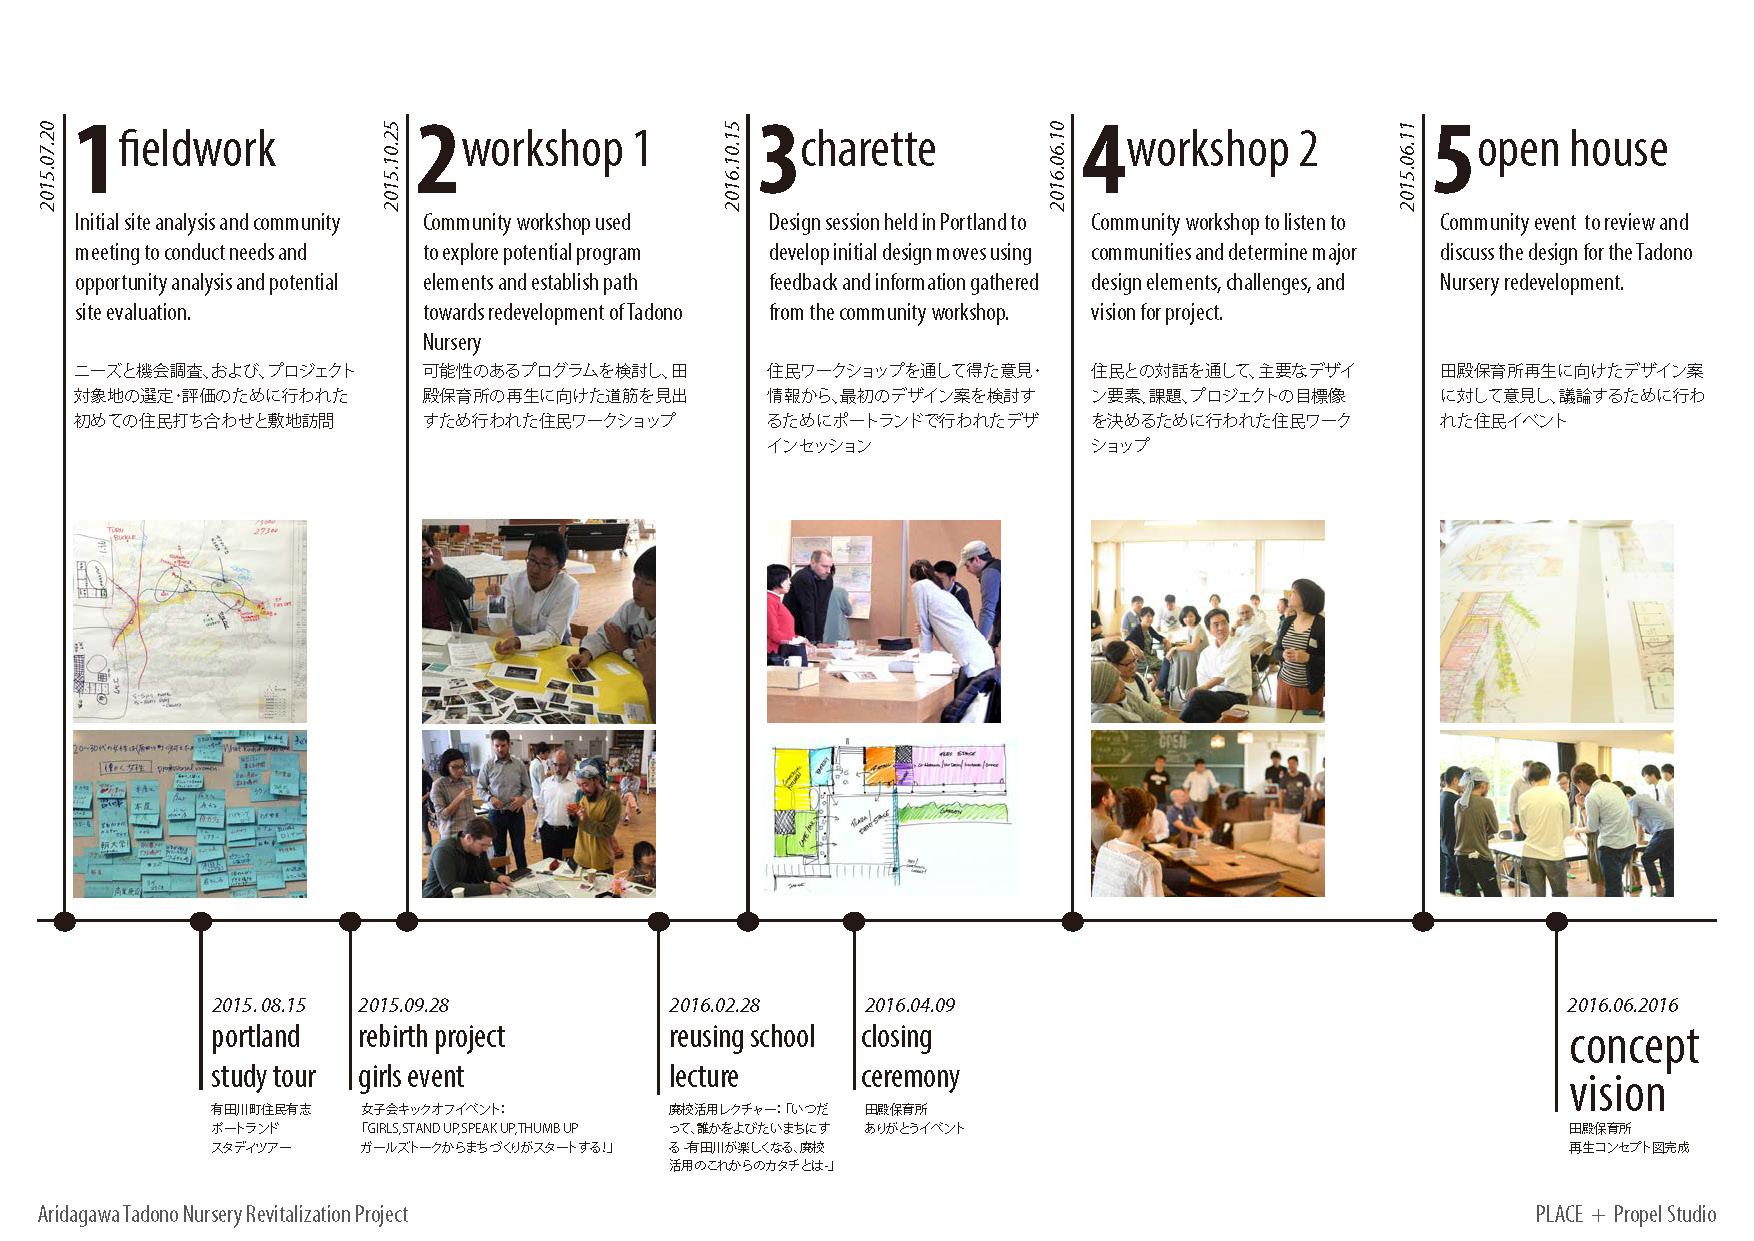 2016.06.30_Aridagawa Summary_Page_05.jpg